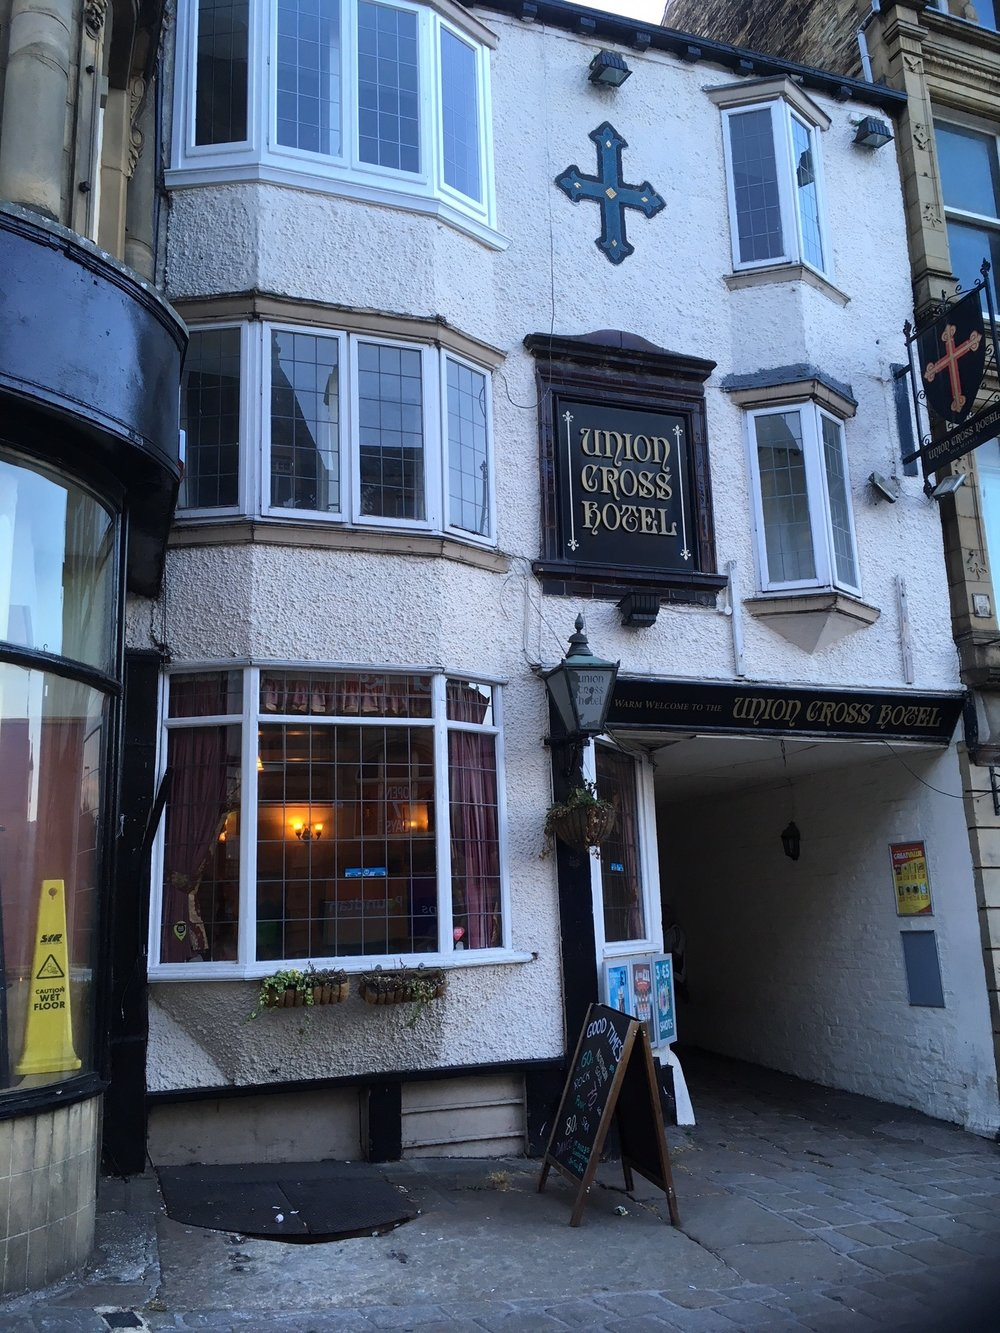 Fairbanks+History+Union+Cross+Pub+in++Halifax.jpg